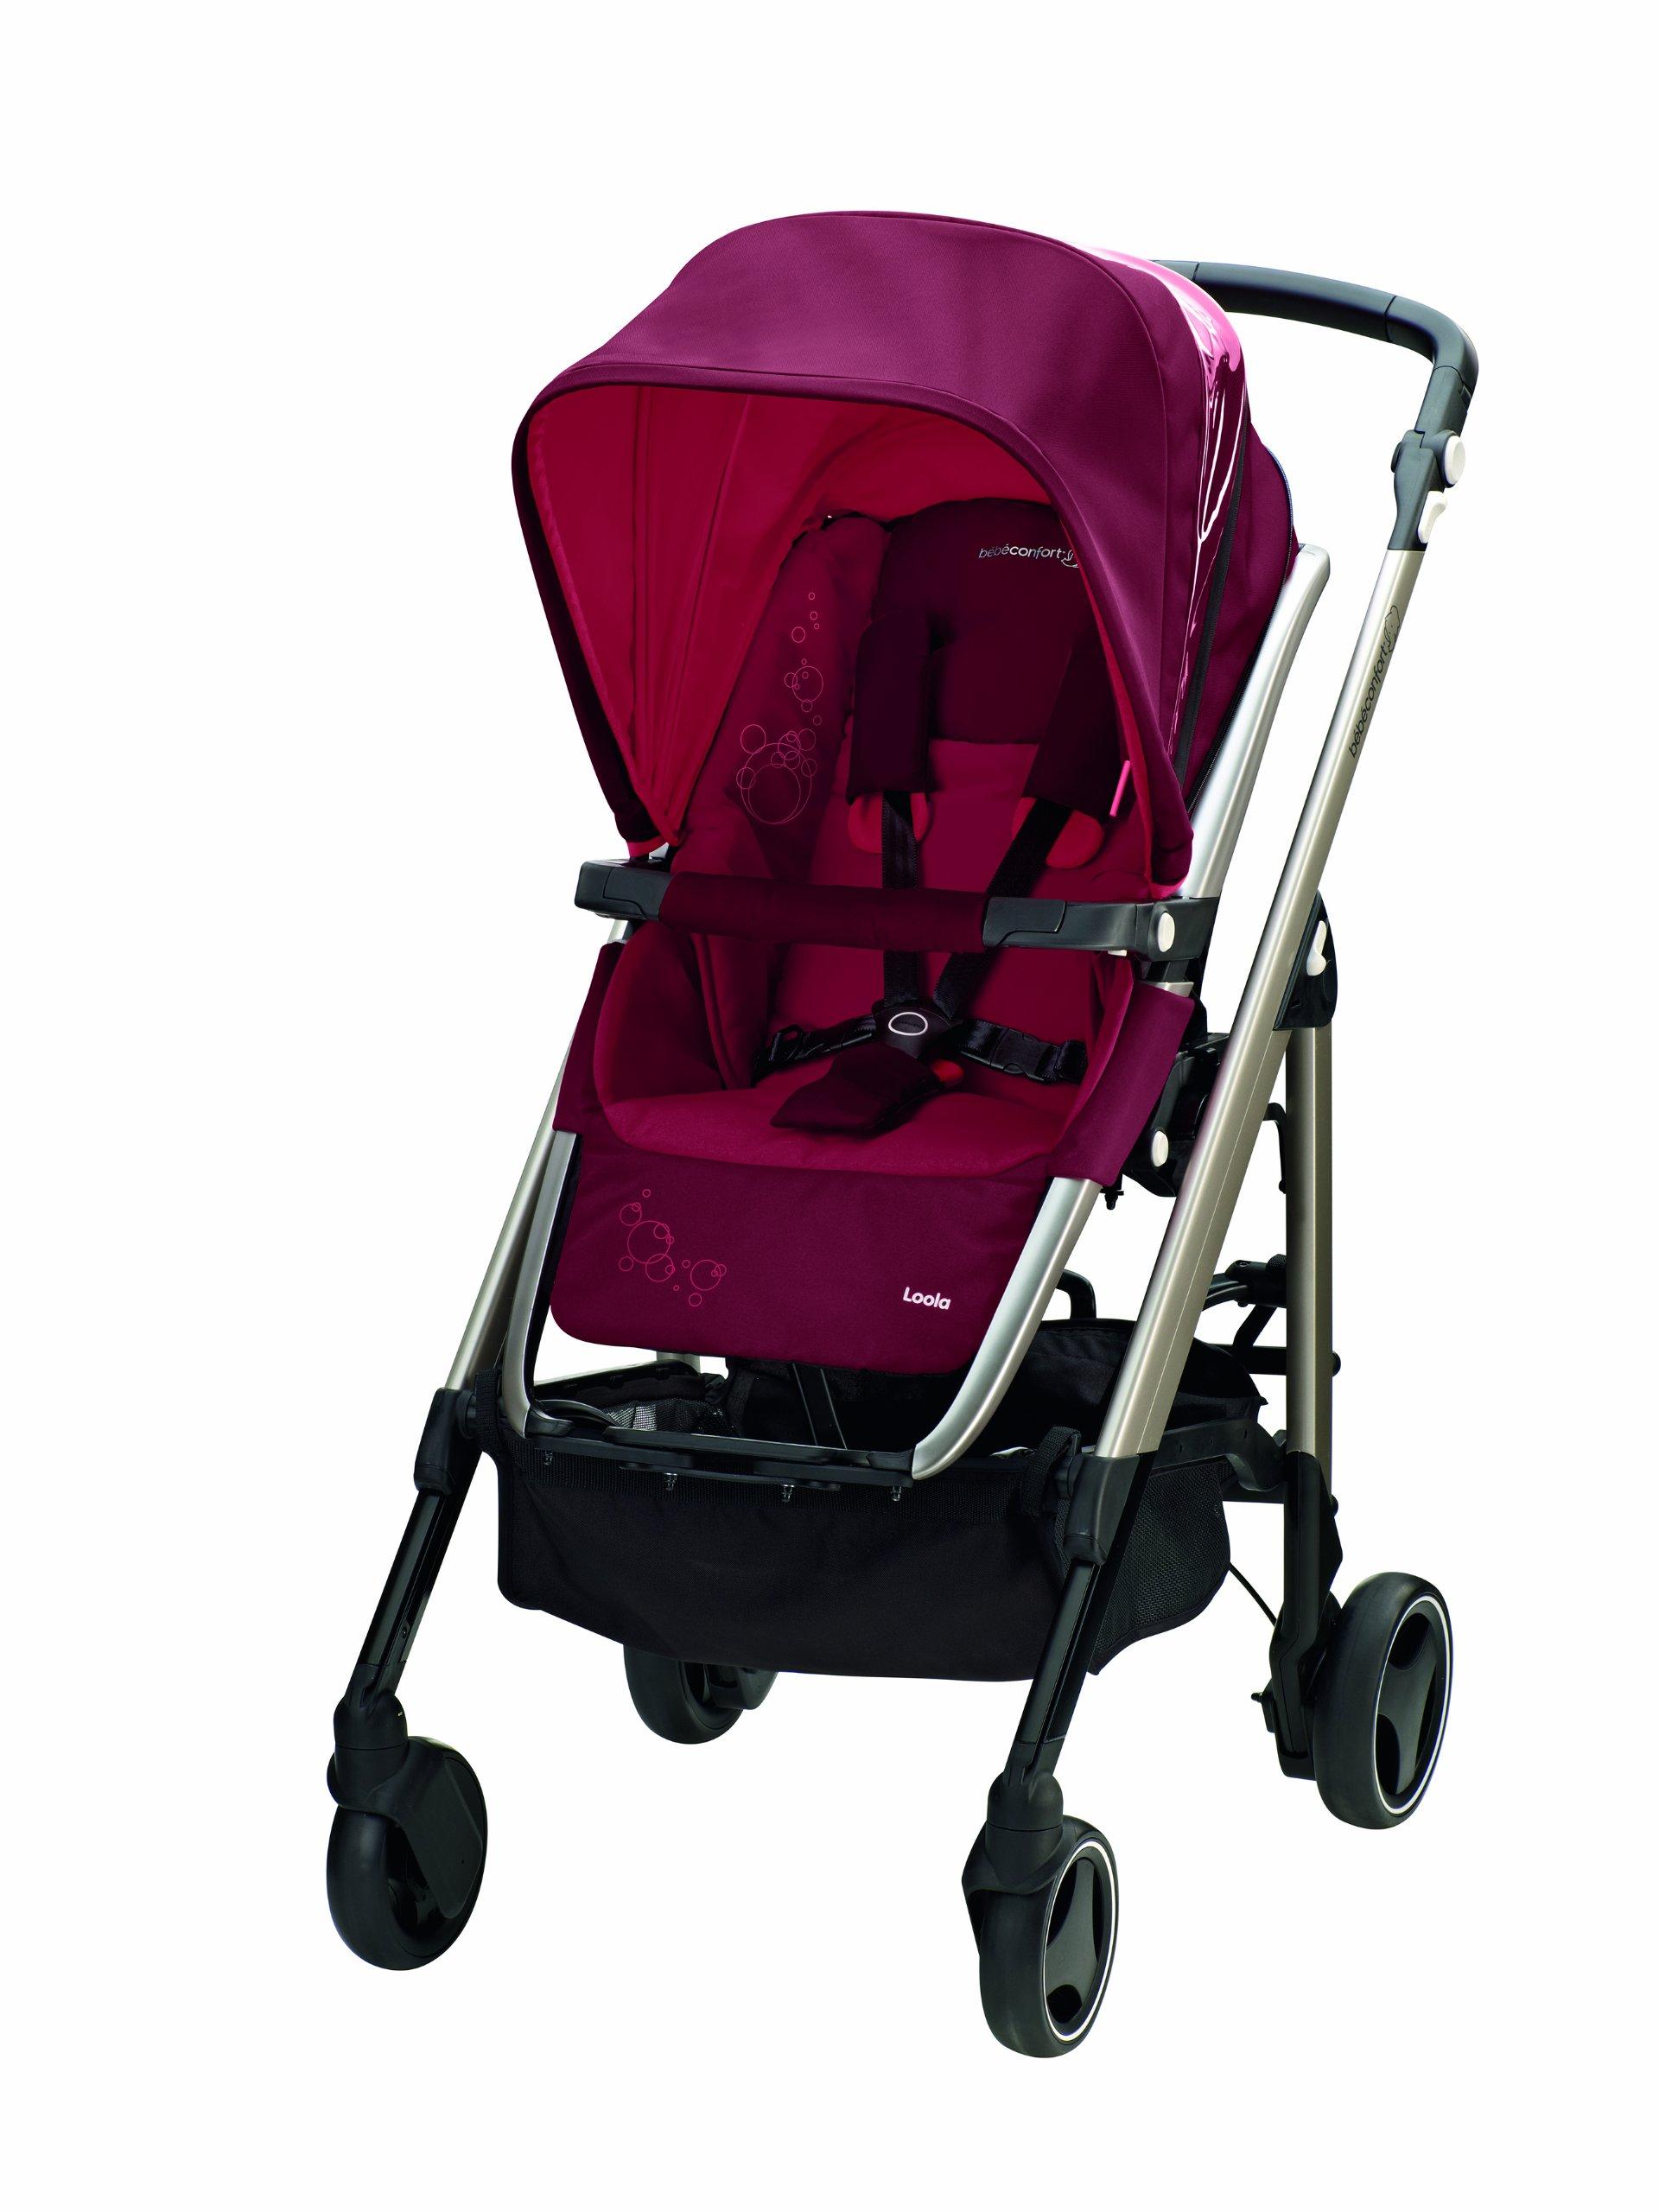 Bébé Confort 13828140 New Loola Passeggino Modulare, Raspberry Red